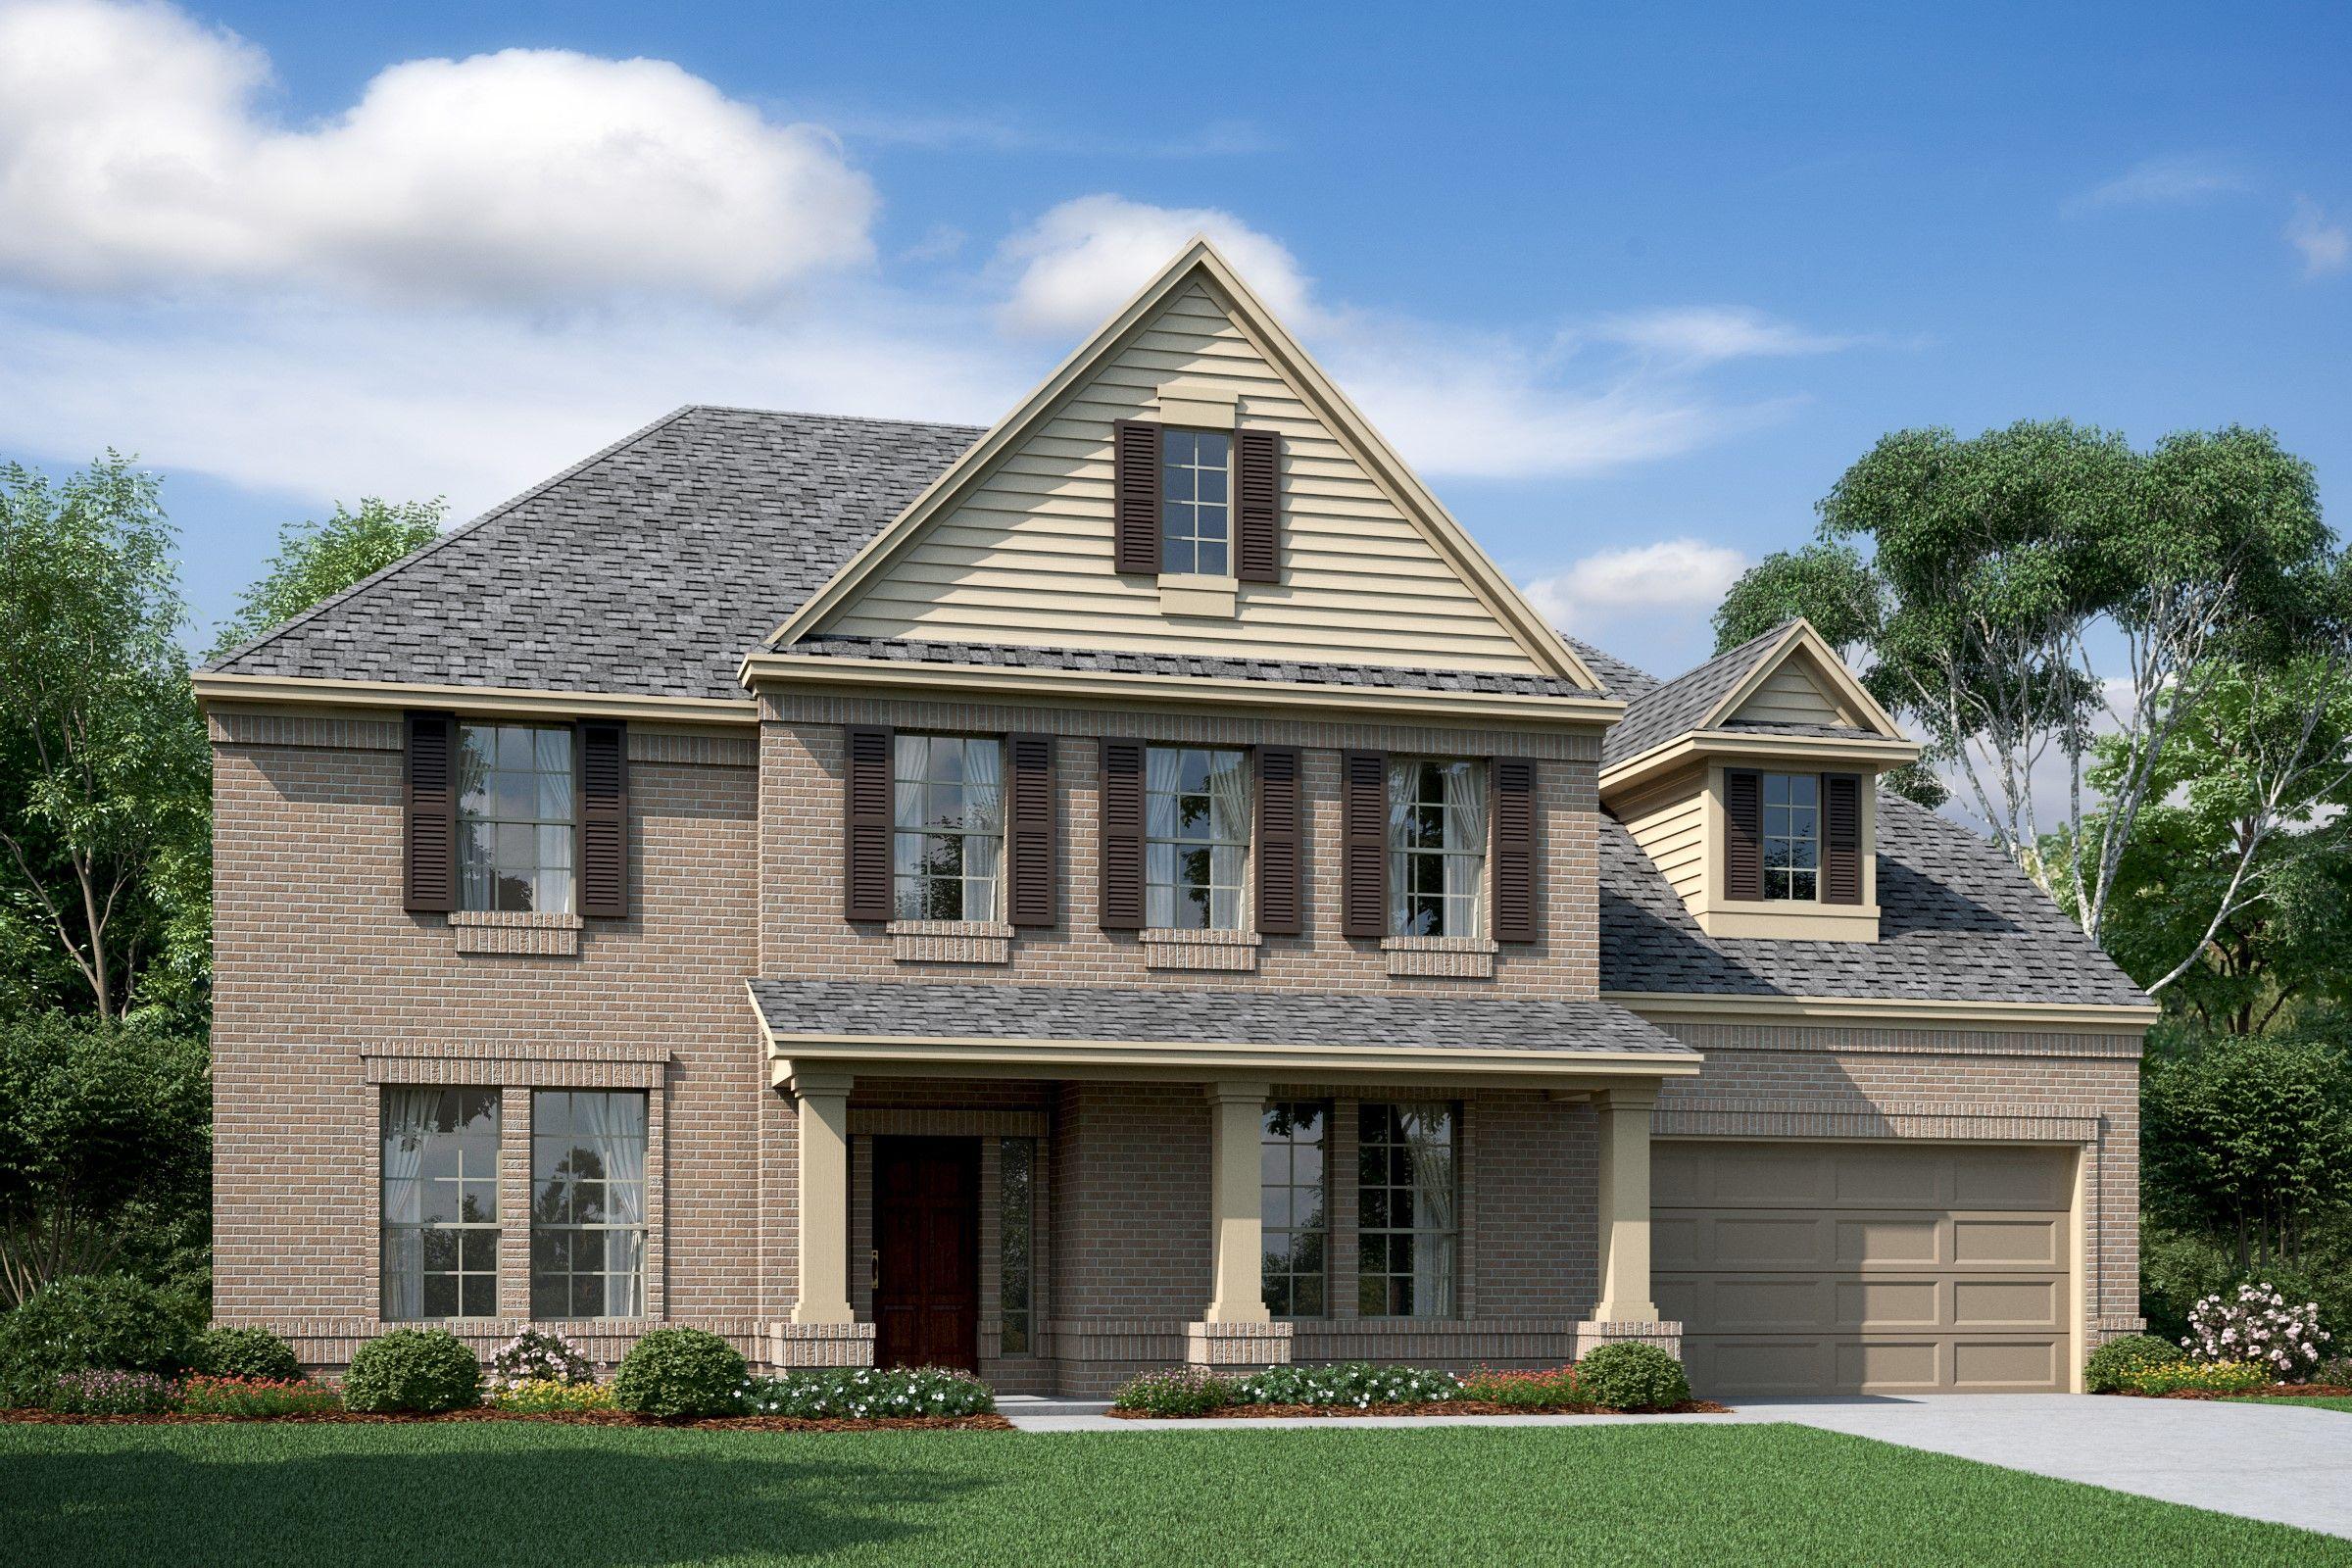 Single Family for Sale at Thunder Bay - Lauren Mccollum Park Rd & Thunder Bay Beach City, Texas 77523 United States